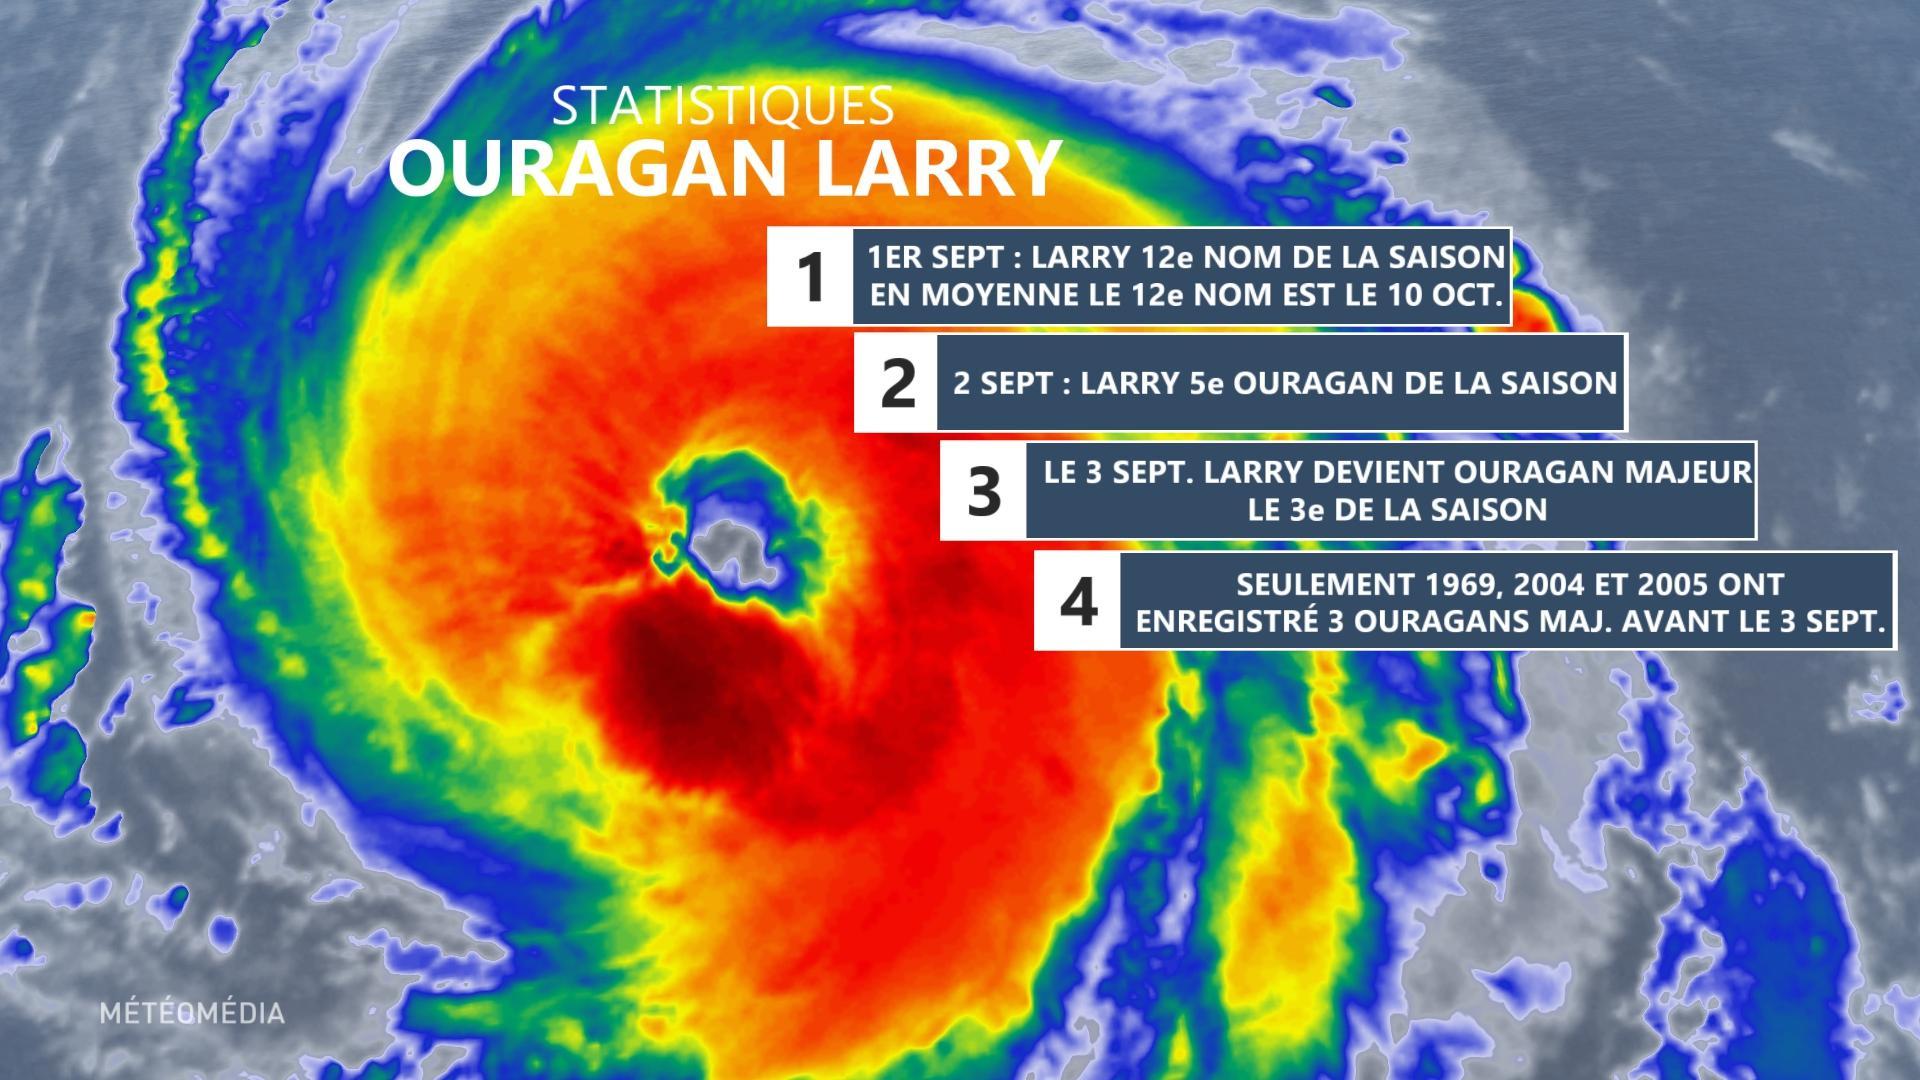 Larry Stat (1)